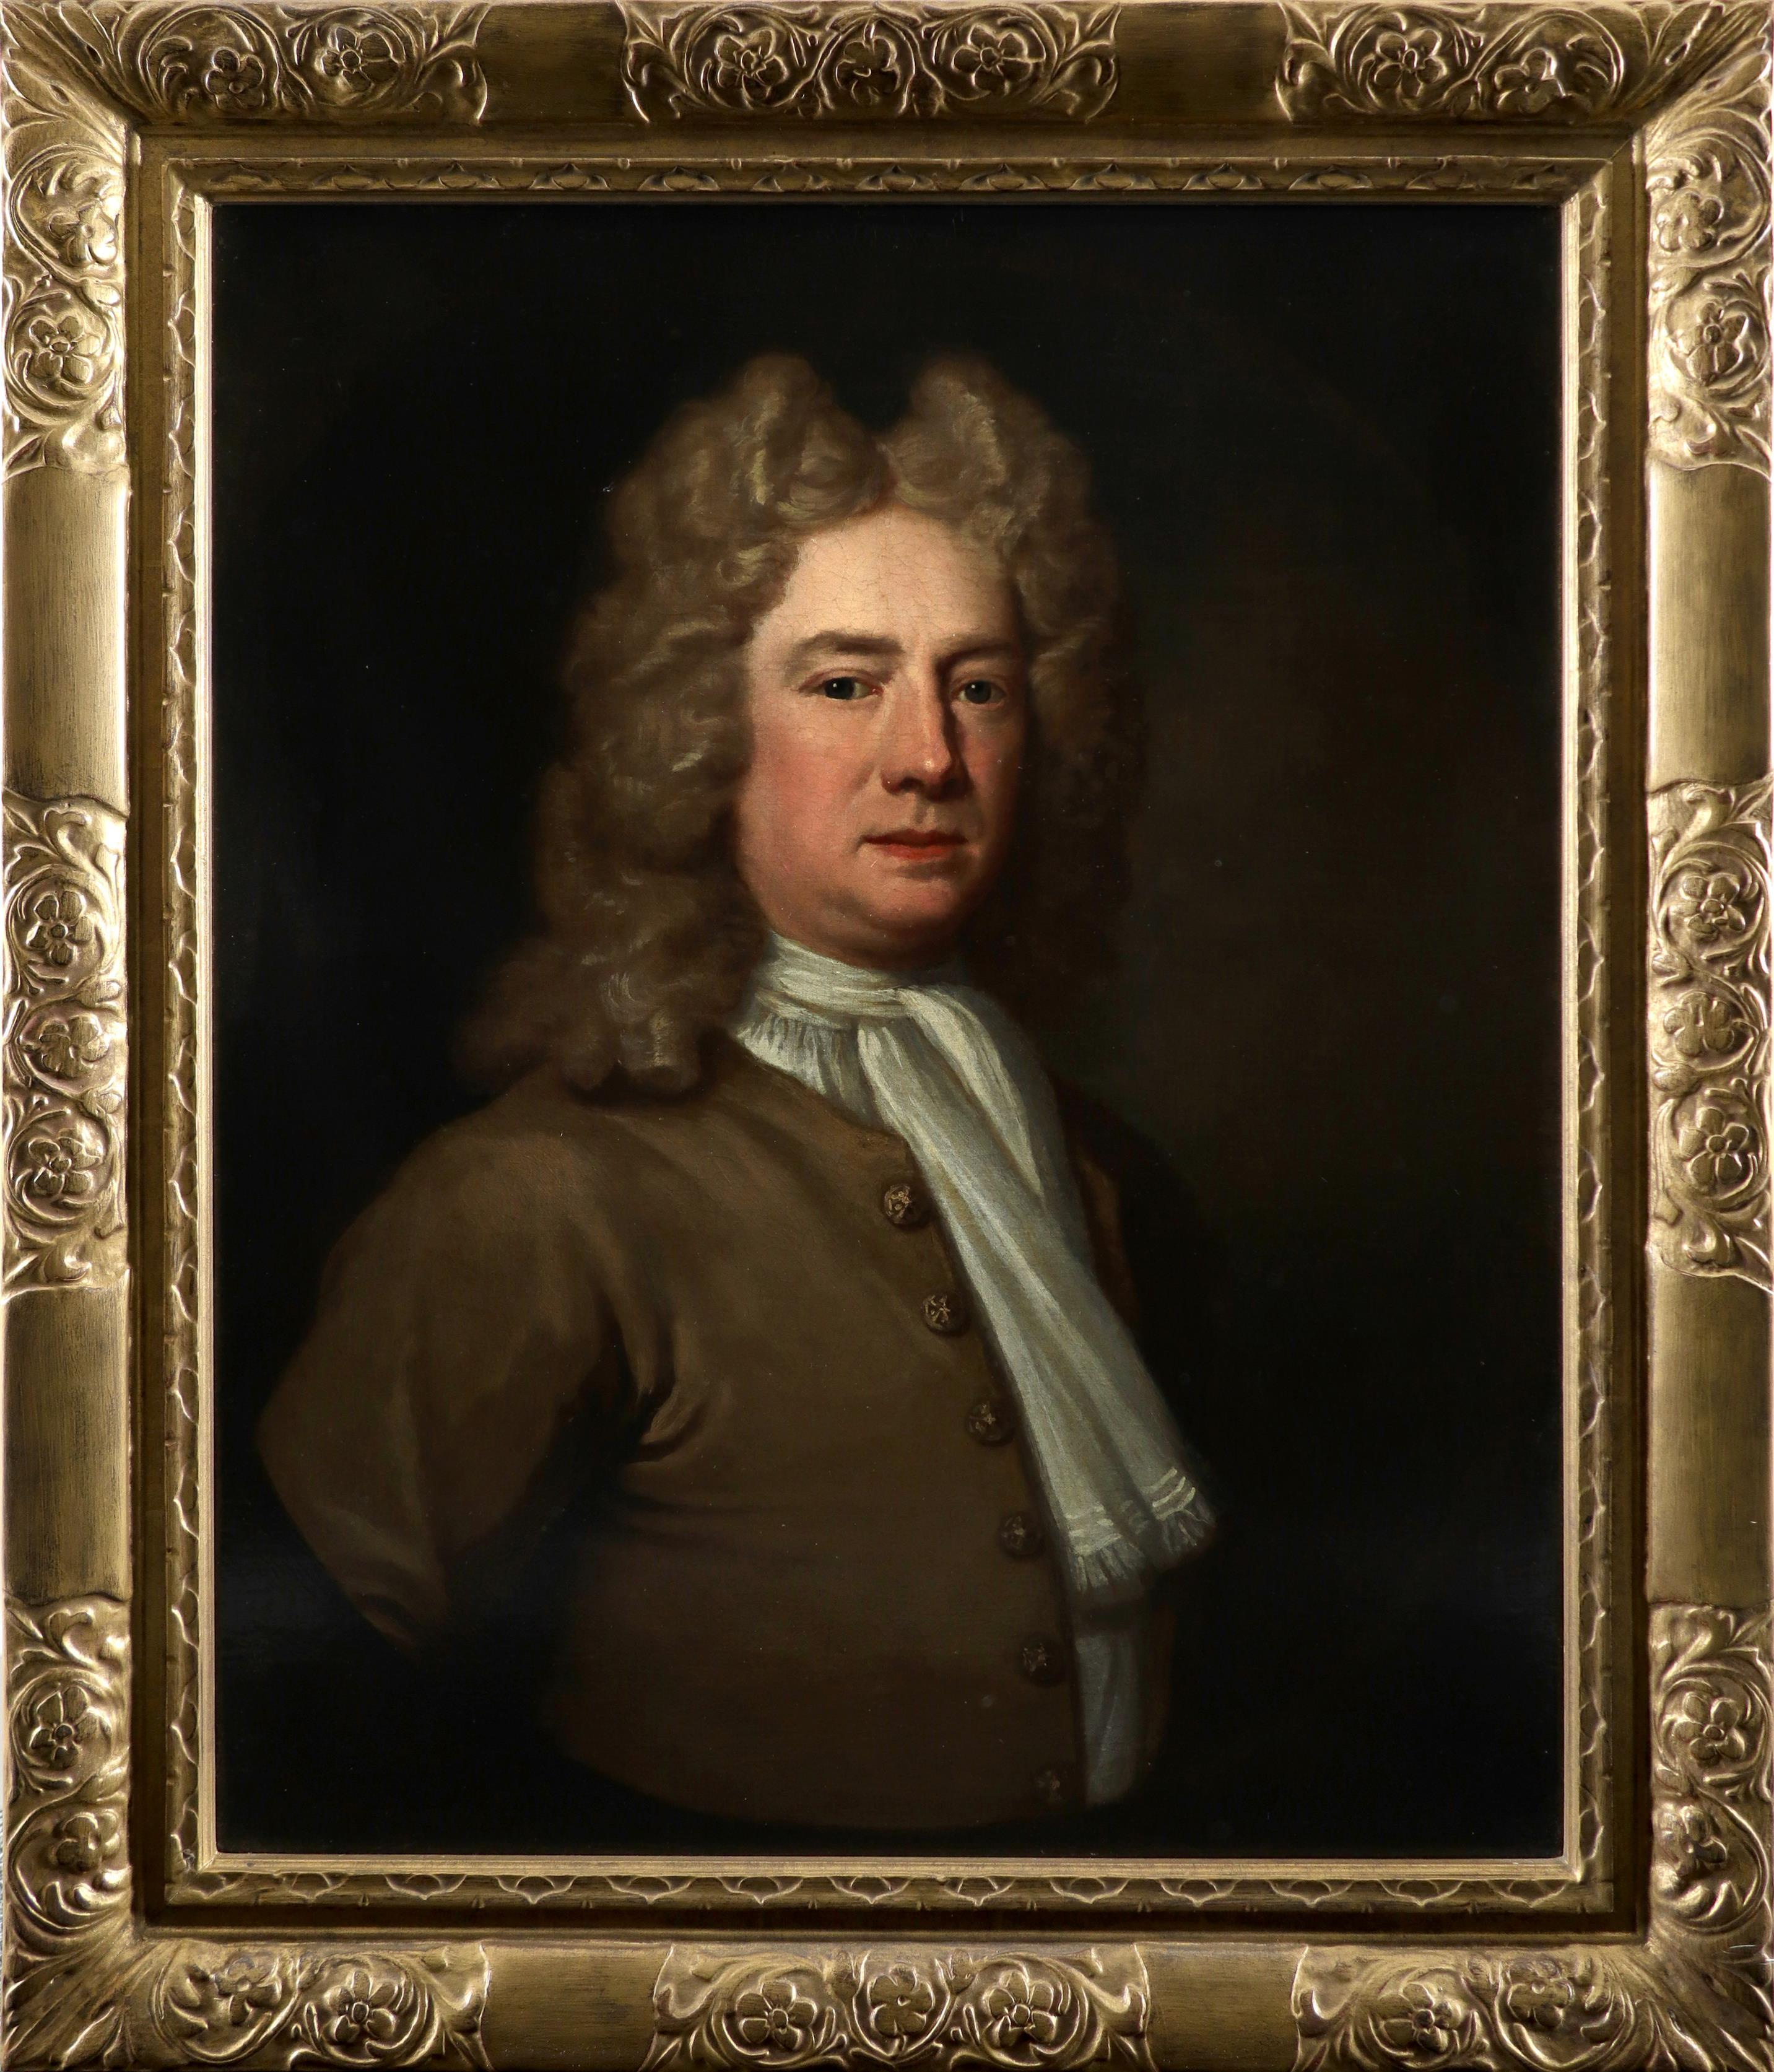 Attributed to Richard van Bleeck (Dutch 1670-1733) Portrait of a gentleman wearing a brown coat, - Image 2 of 3